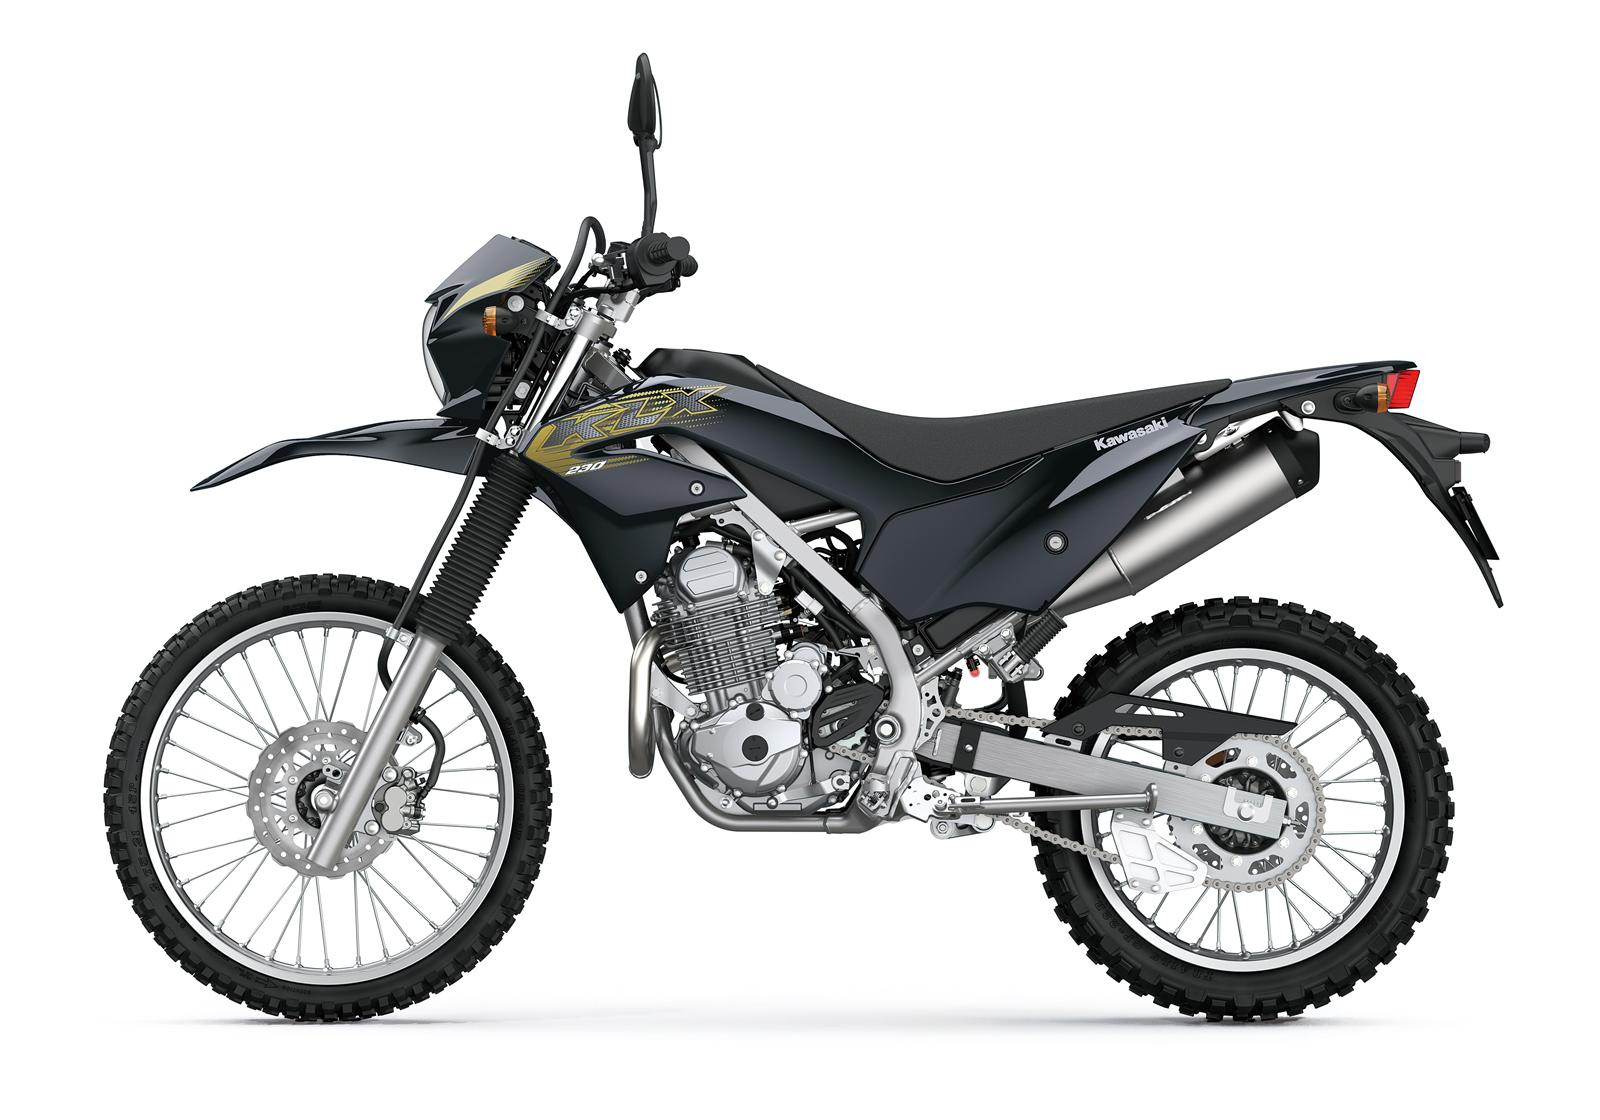 Kawasaki KLX230 malowanie 2020 lewa